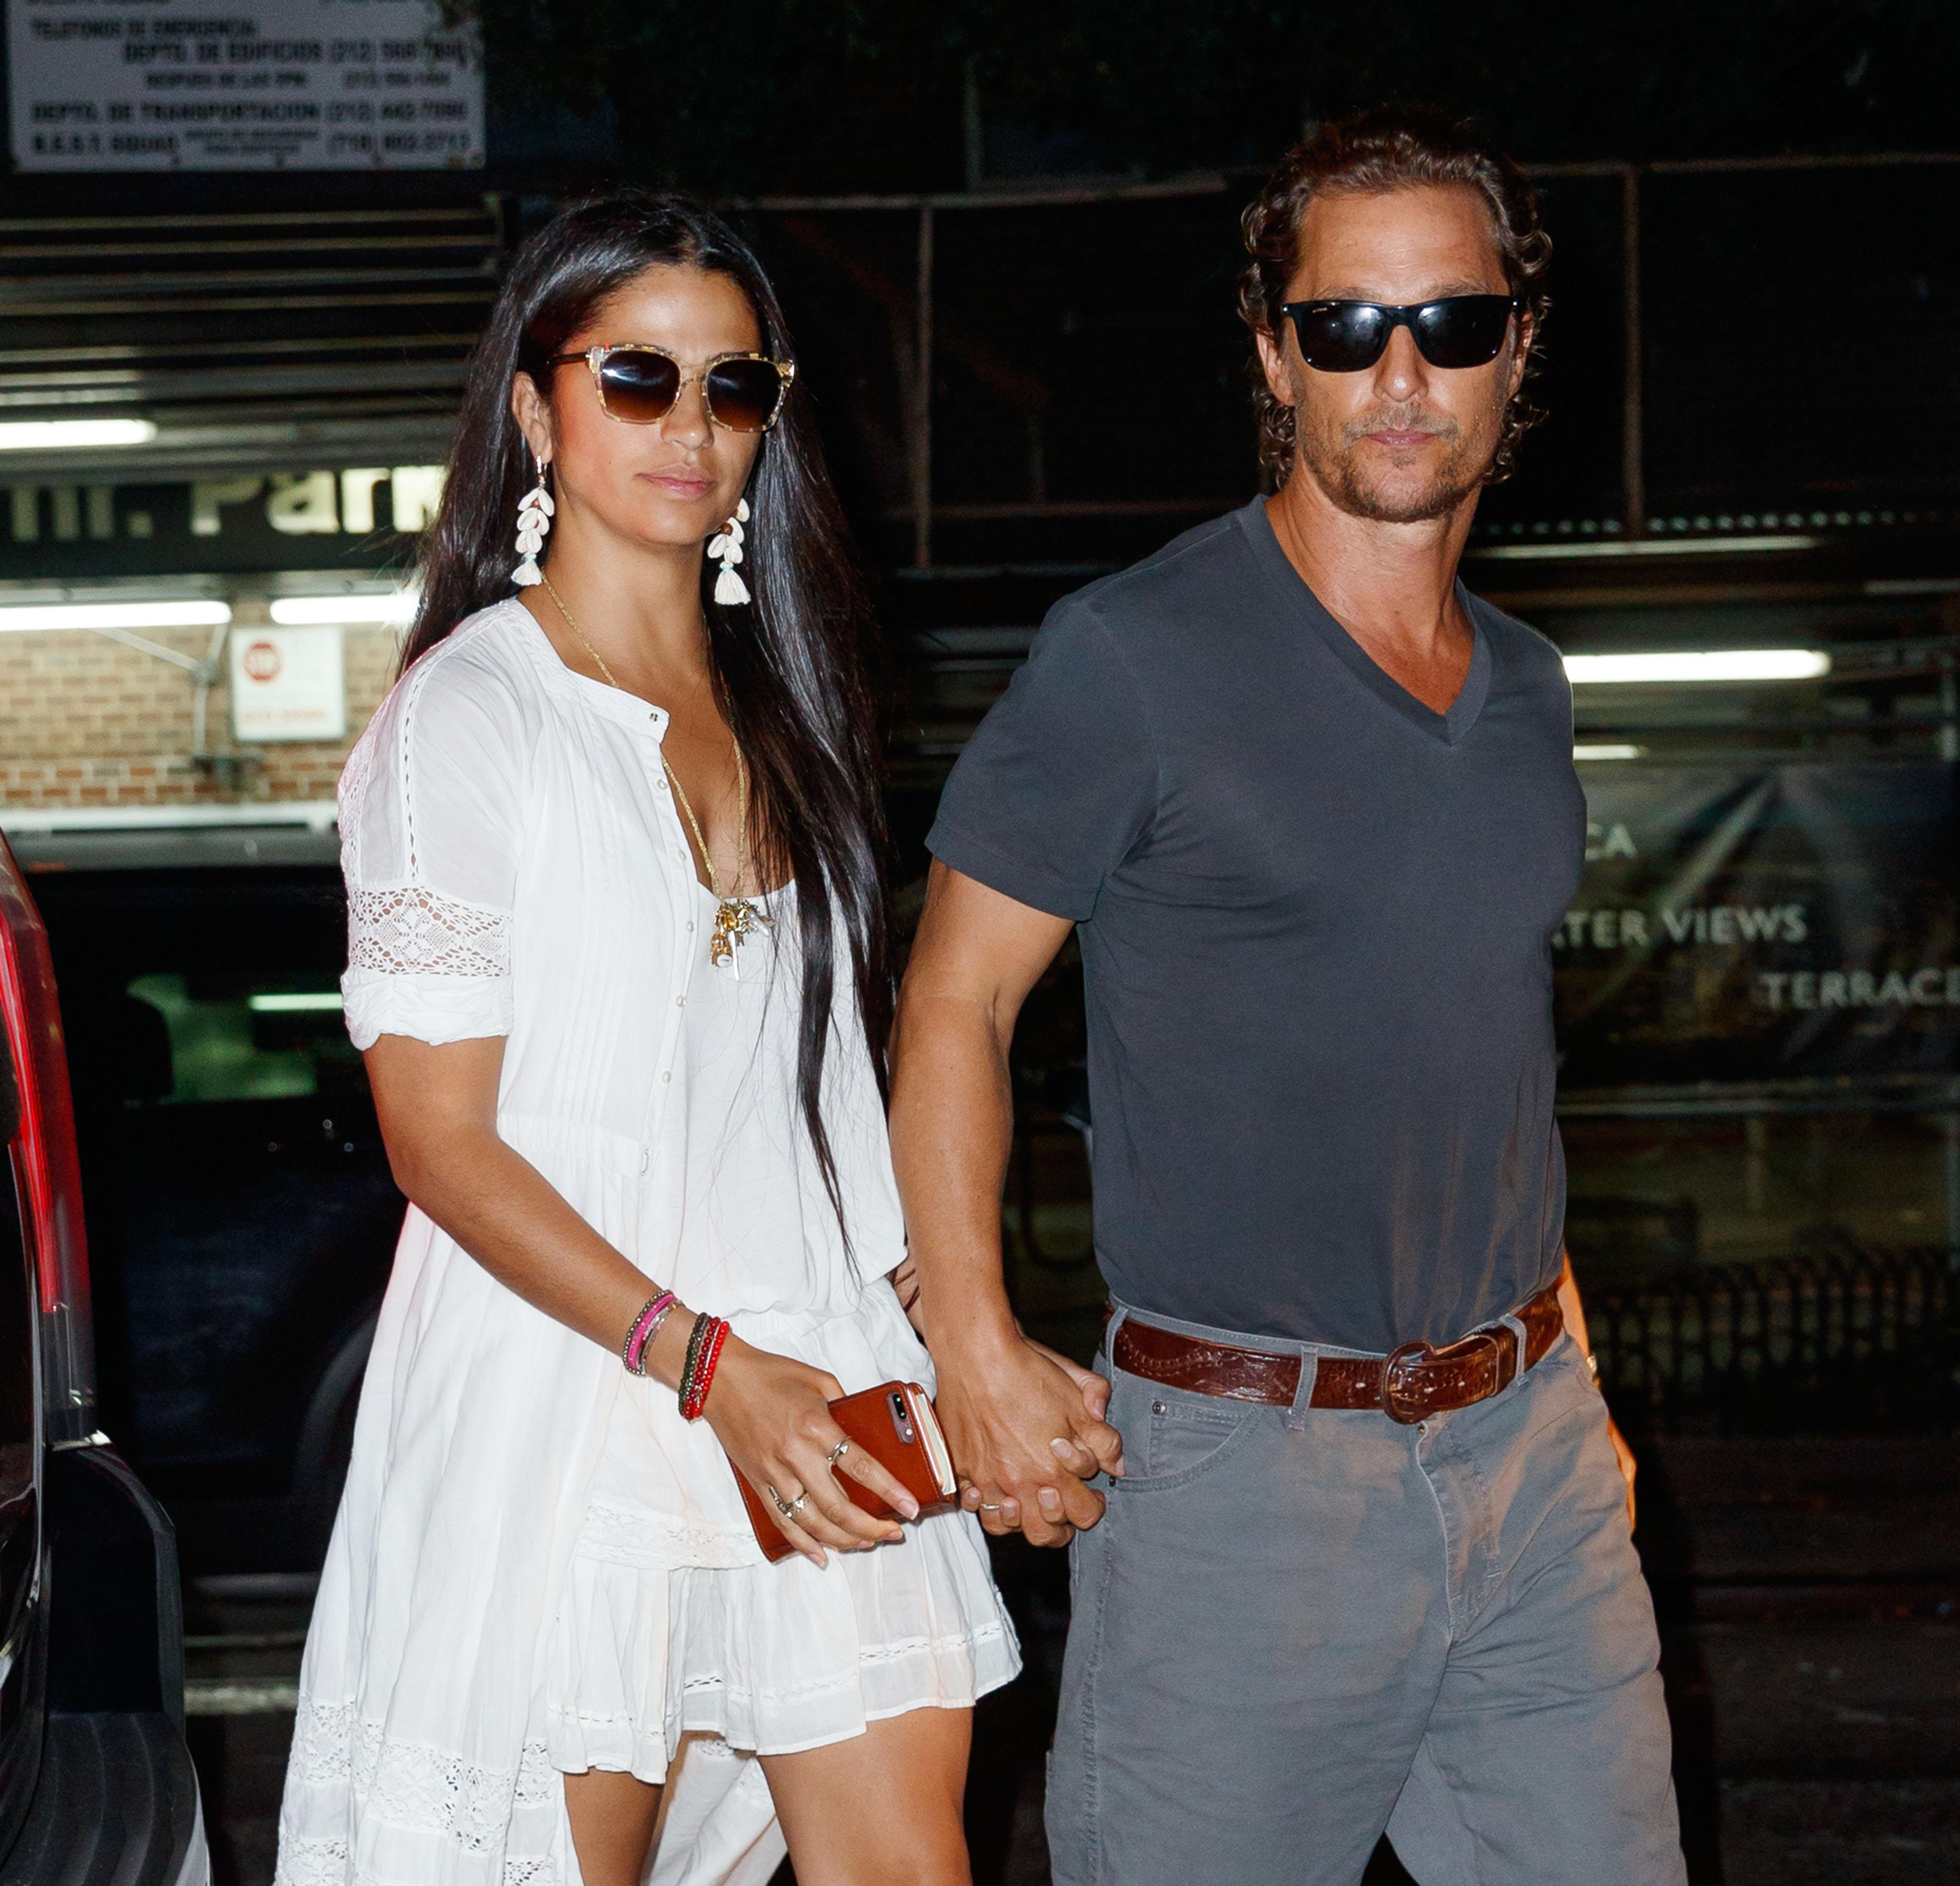 Matthew McConaughey and Camila Alves go to see a screening in New York. <P> Pictured: Matthew McConaughey and Camila Alves <B>Ref: SPL1590475  270917  </B><BR/> Picture by: Jackson Lee / Splash News<BR/> </P><P> <B>Splash News and Pictures</B><BR/> Los Angeles:310-821-2666<BR/> New York:212-619-2666<BR/> London:870-934-2666<BR/> <span id=